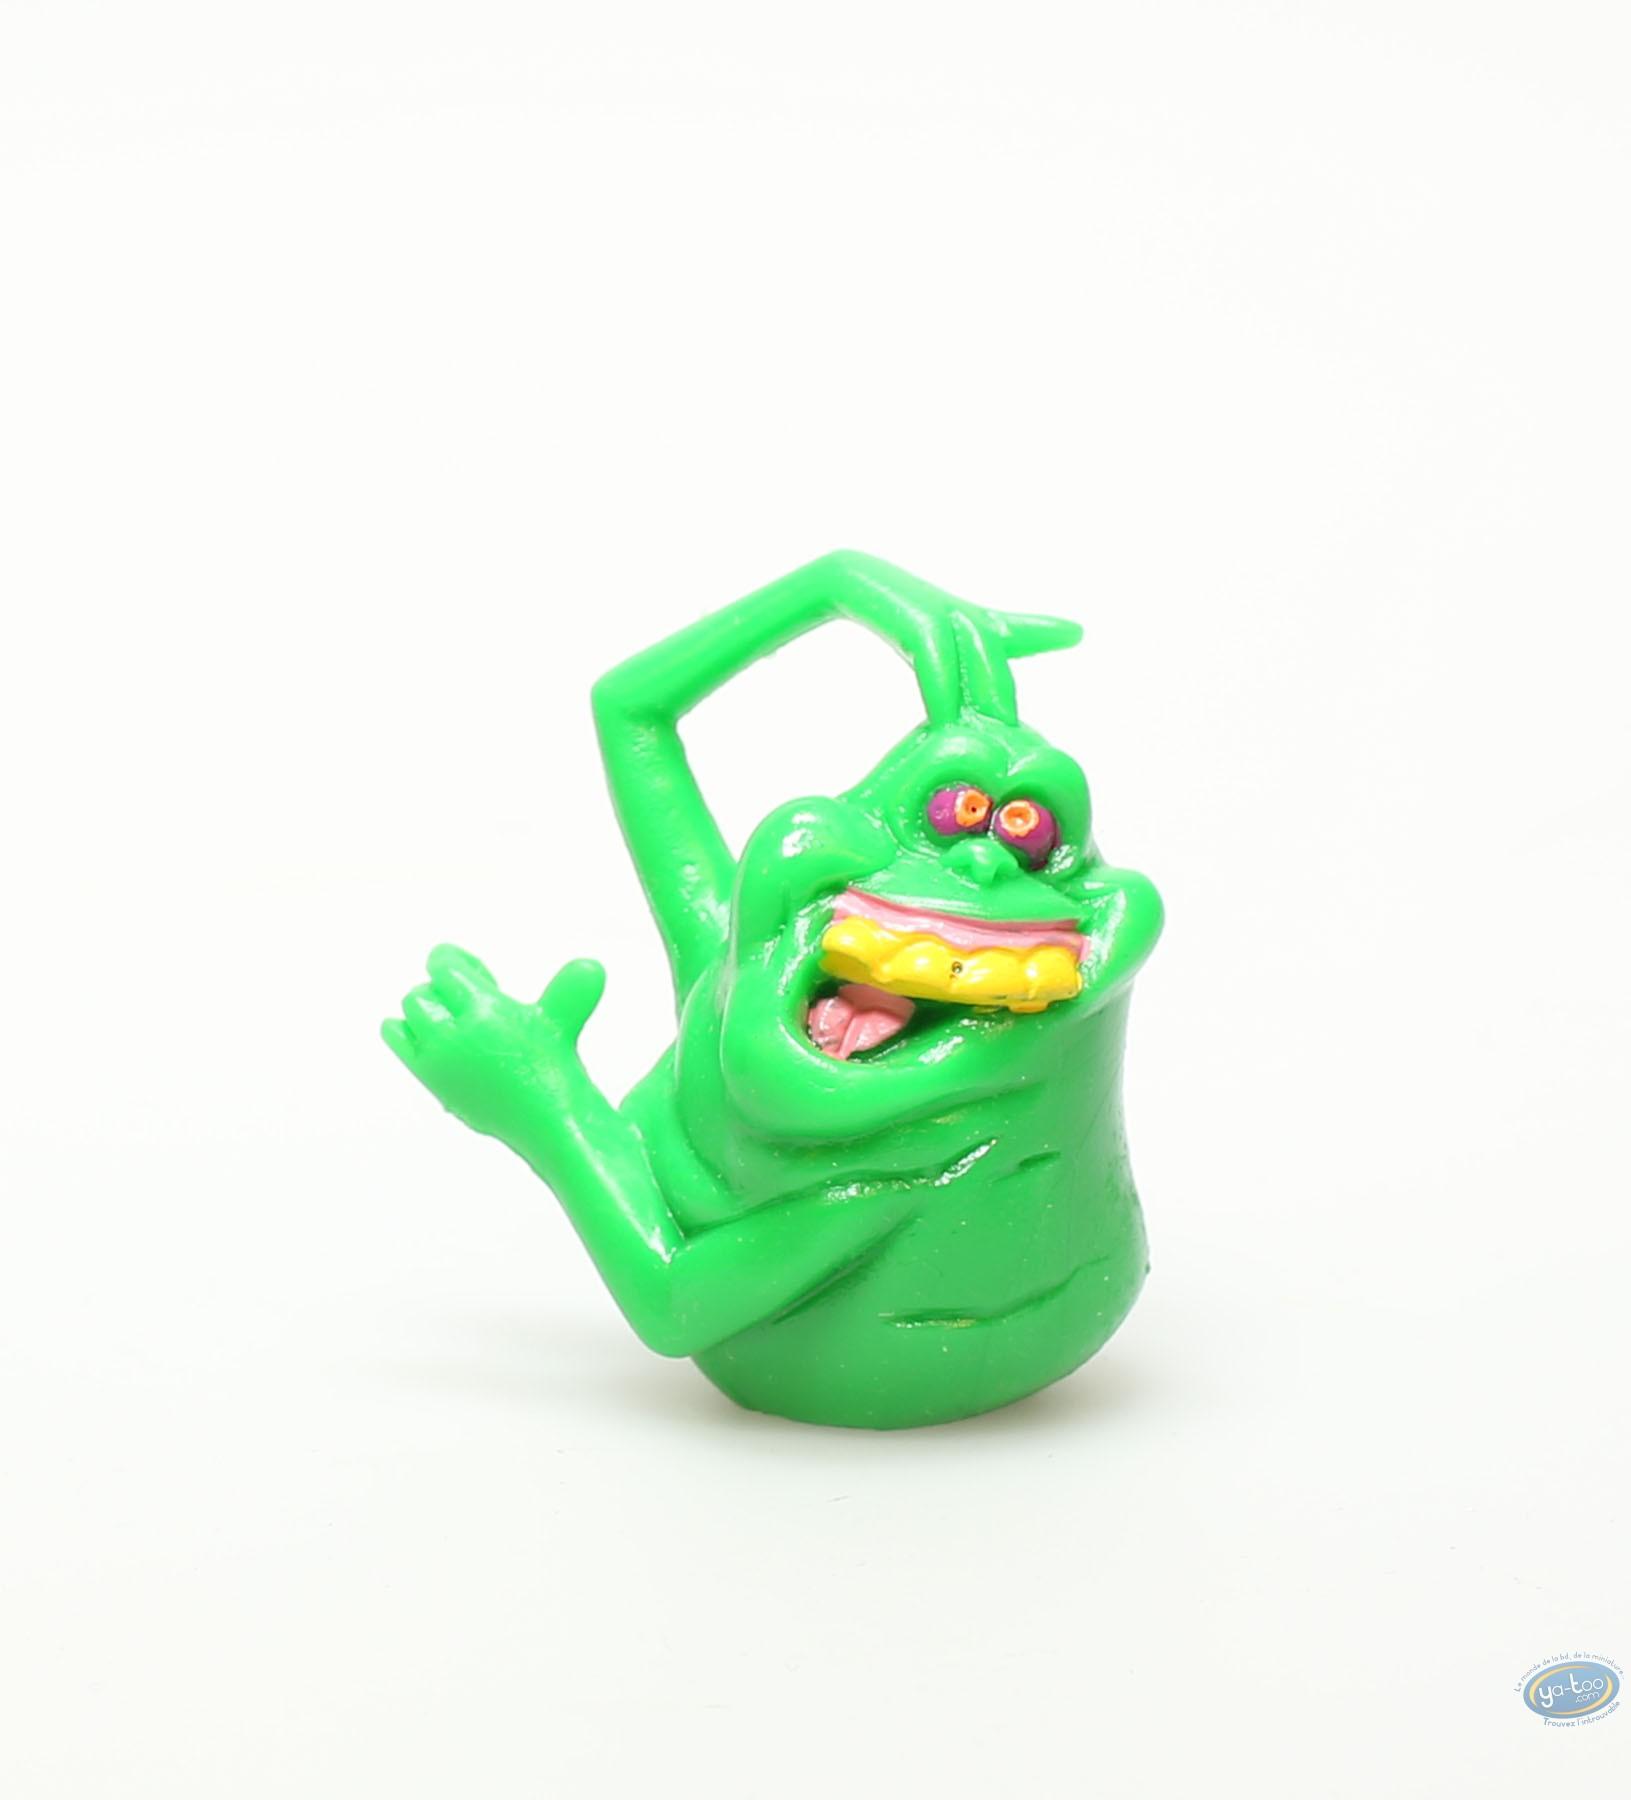 Figurine plastique, Ghostbusters : Slimer petit